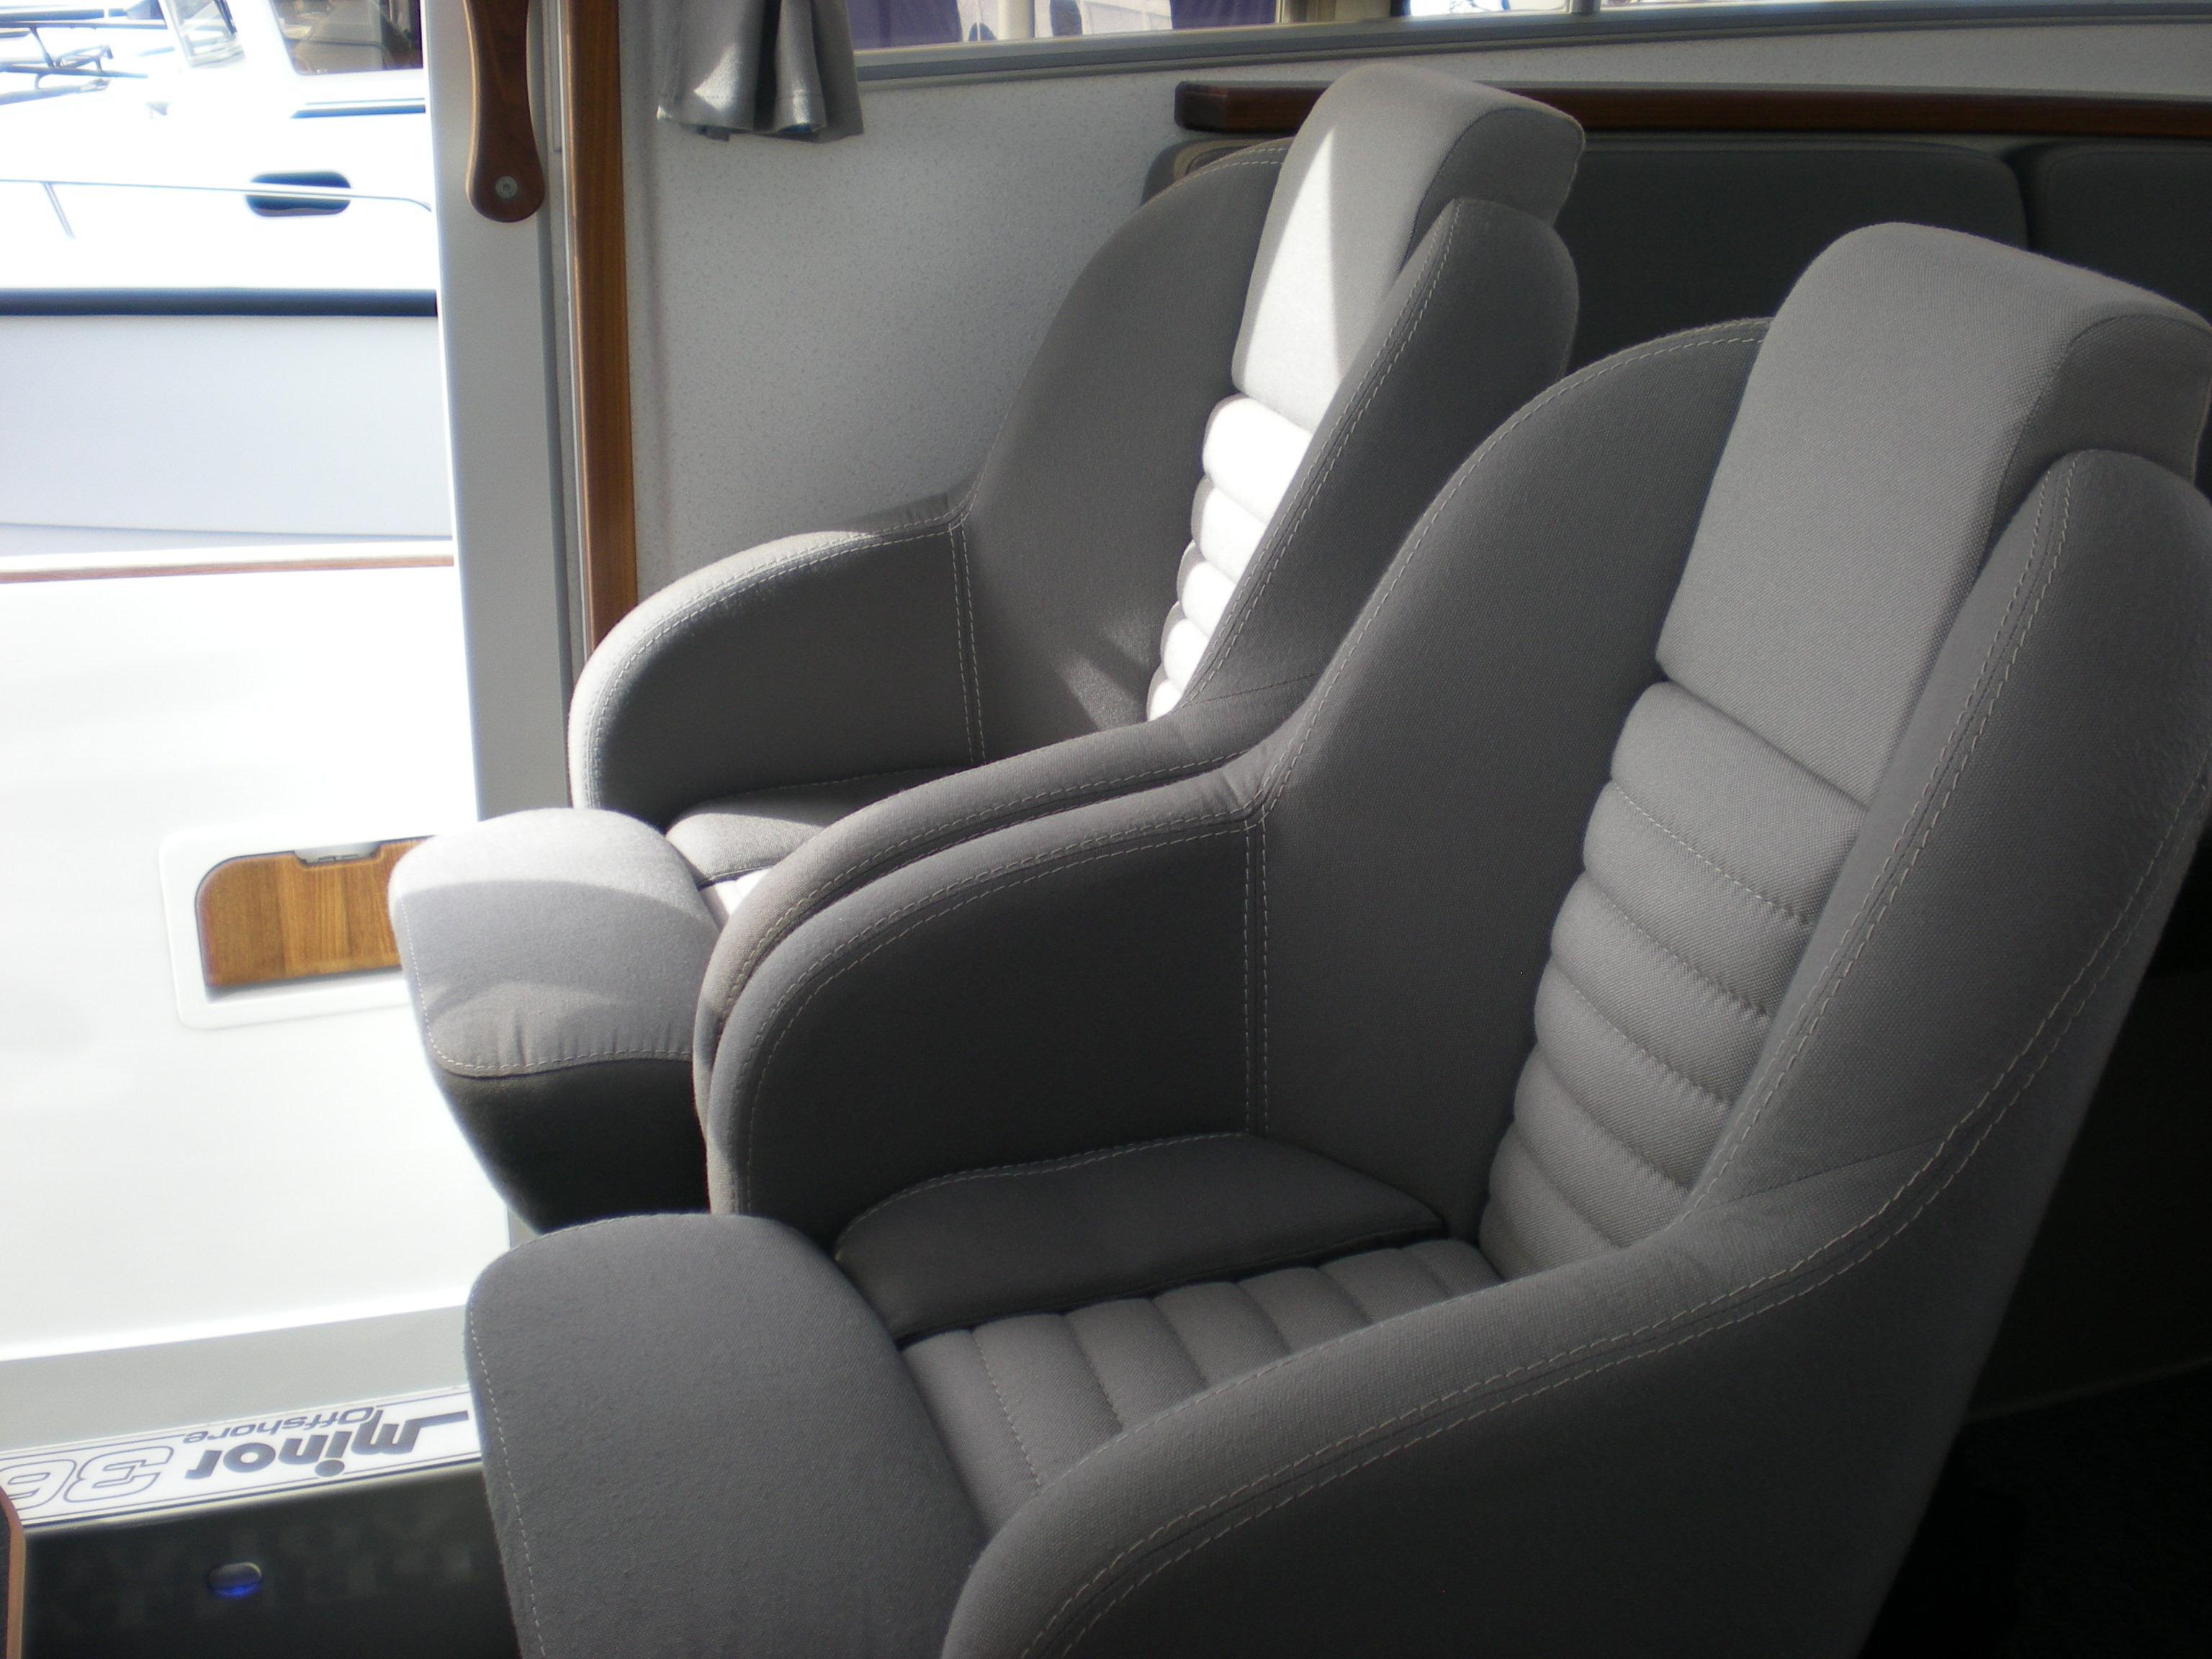 Sargo 36 Fly - helm seats